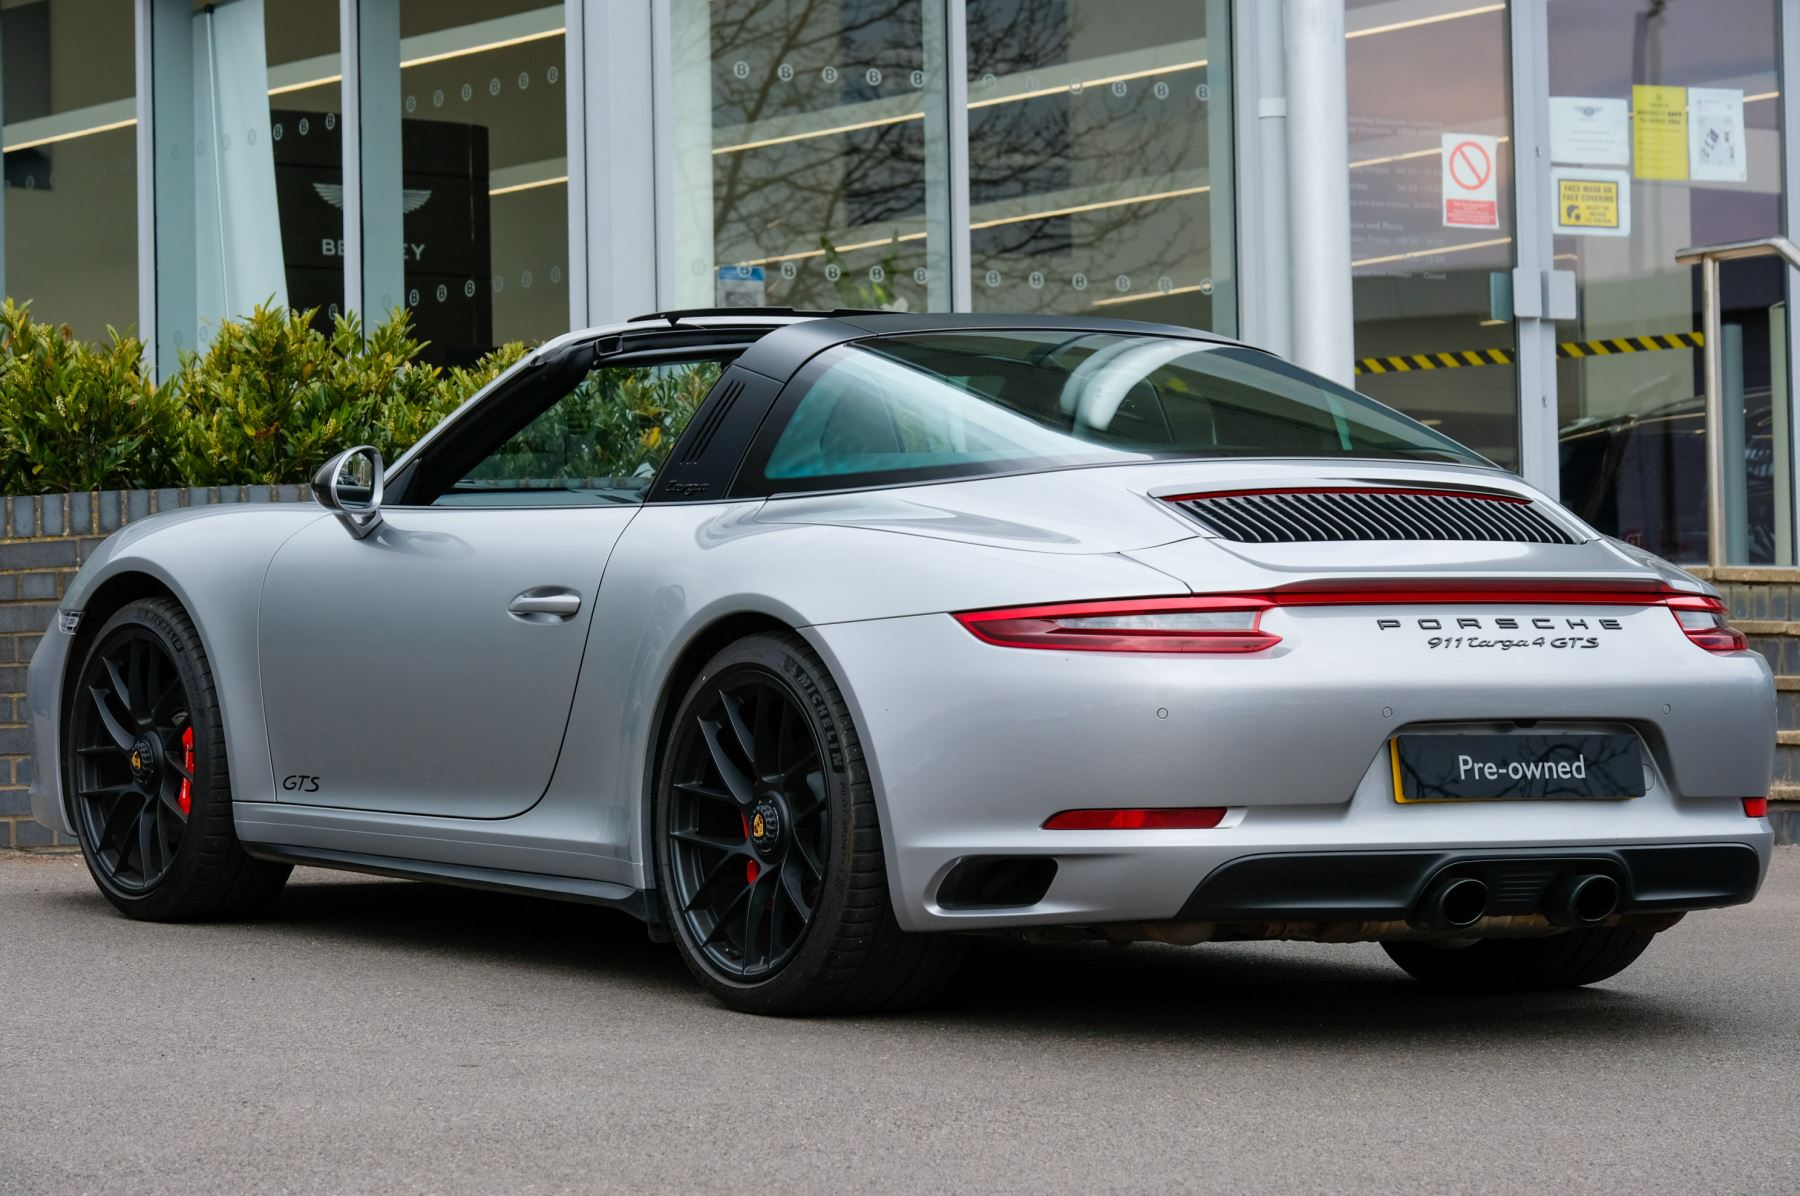 Porsche 911 TARGA 4 GTS - PDK - SPORT DESIGN PACKAGE - GTS INTERIOR PACKAGE image 37